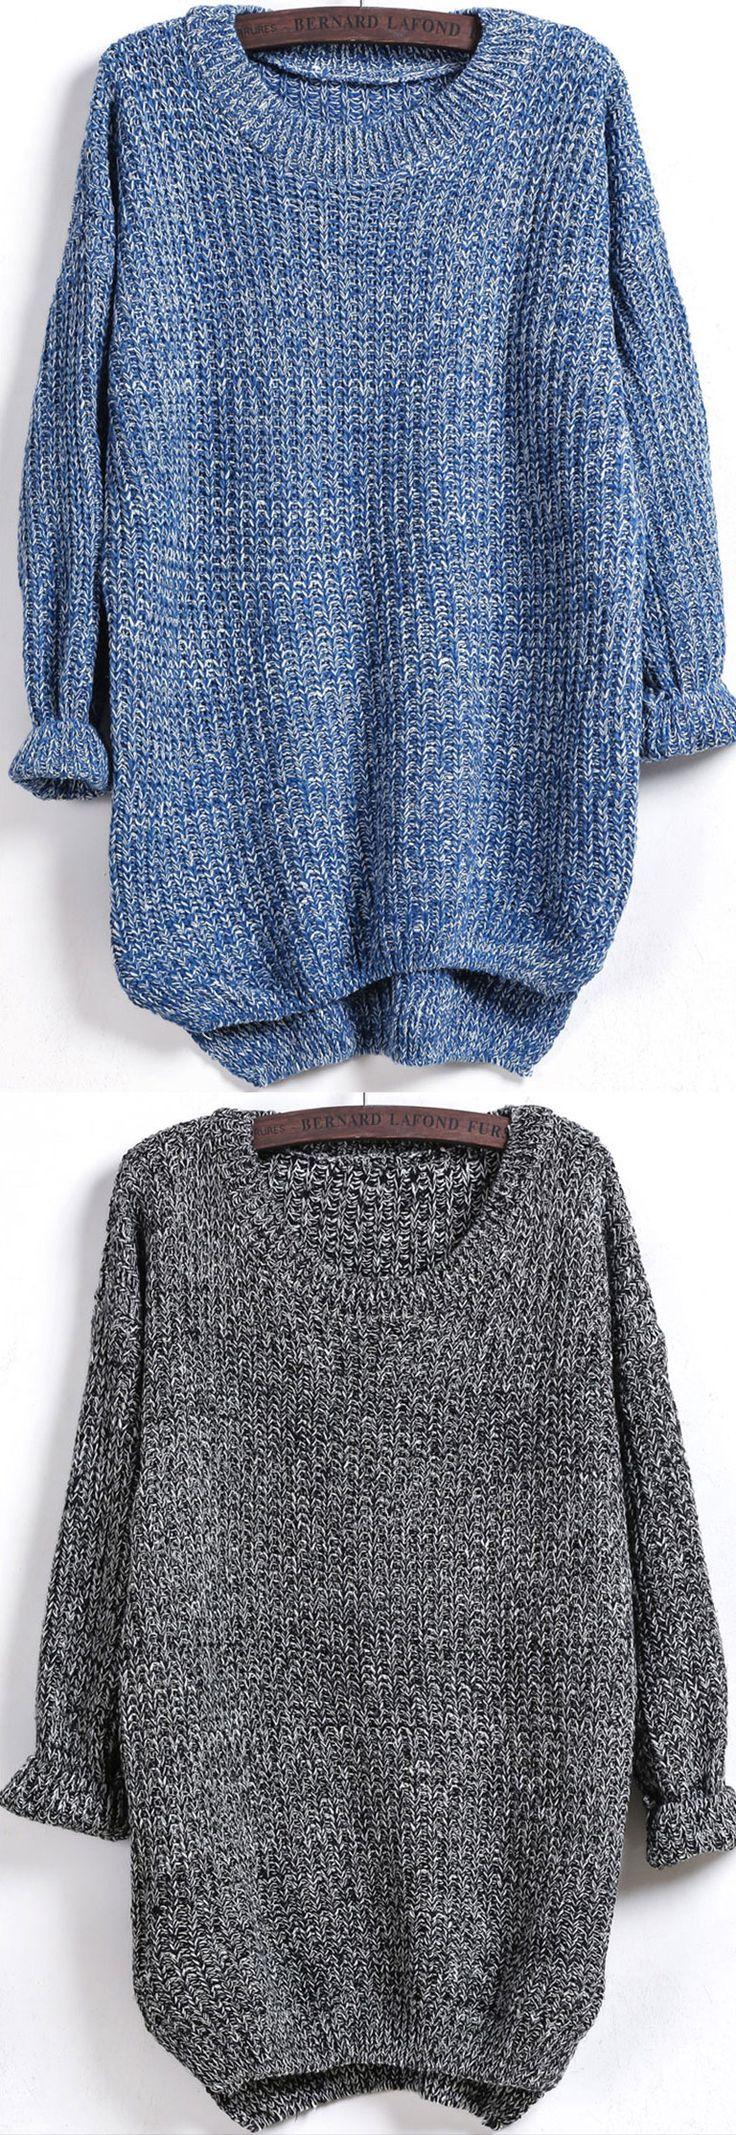 Dipped Hem Loose Knit Blue Sweater